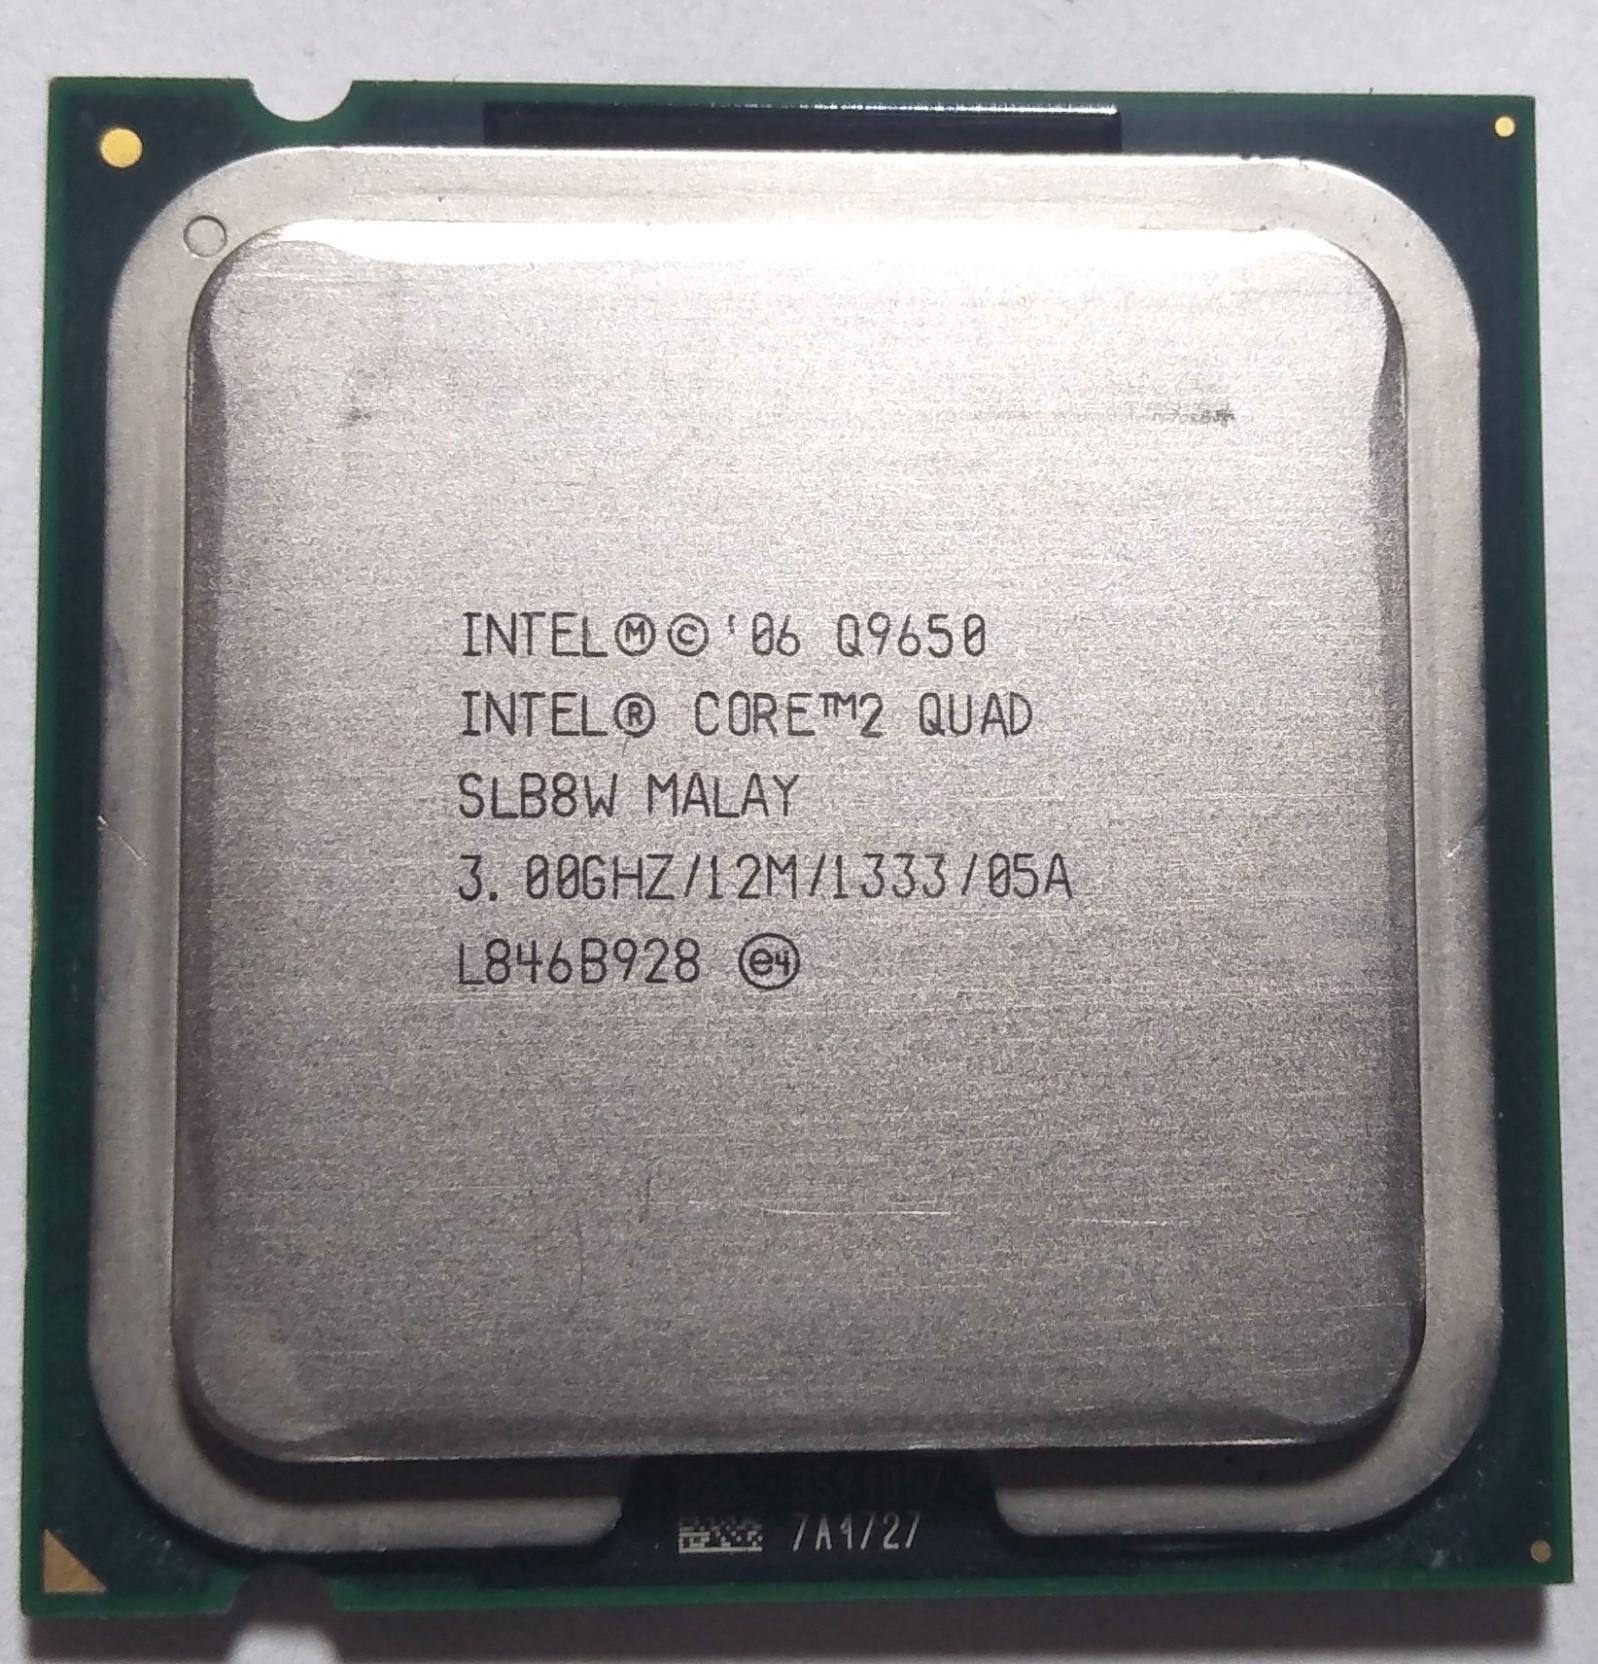 Intel 30 Lga 775 Core 2 Quad Q9650 Processor Prosesor E8500 Add To Cart